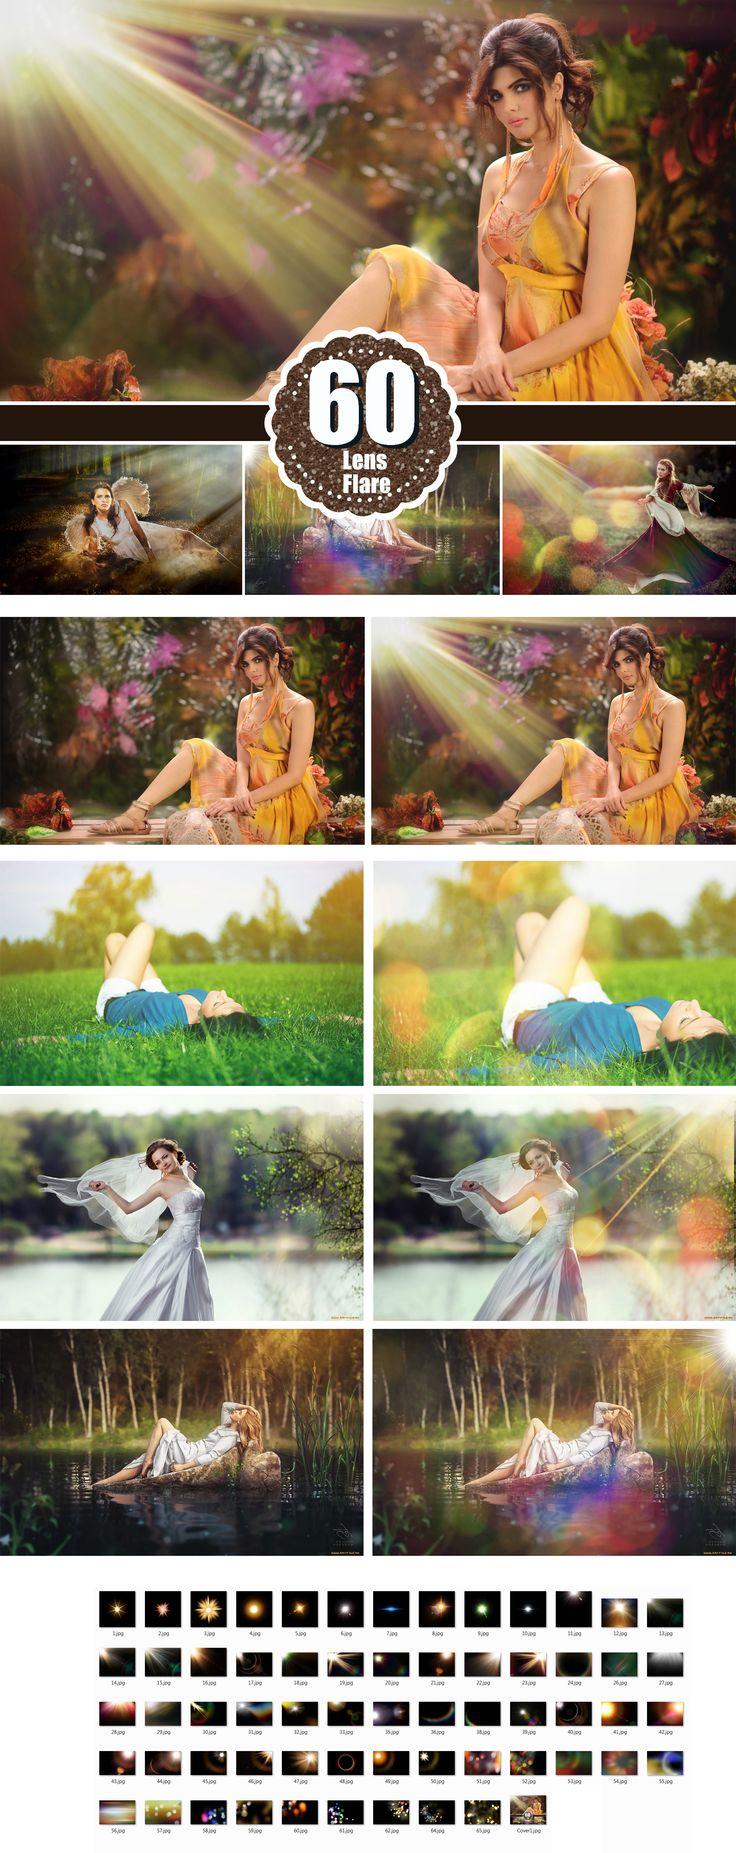 Natural Sun Light Photoshop Overlays, Fairy Glow Effect, Sun Rays, Sun Lens Flare, Sun beams and streaks,